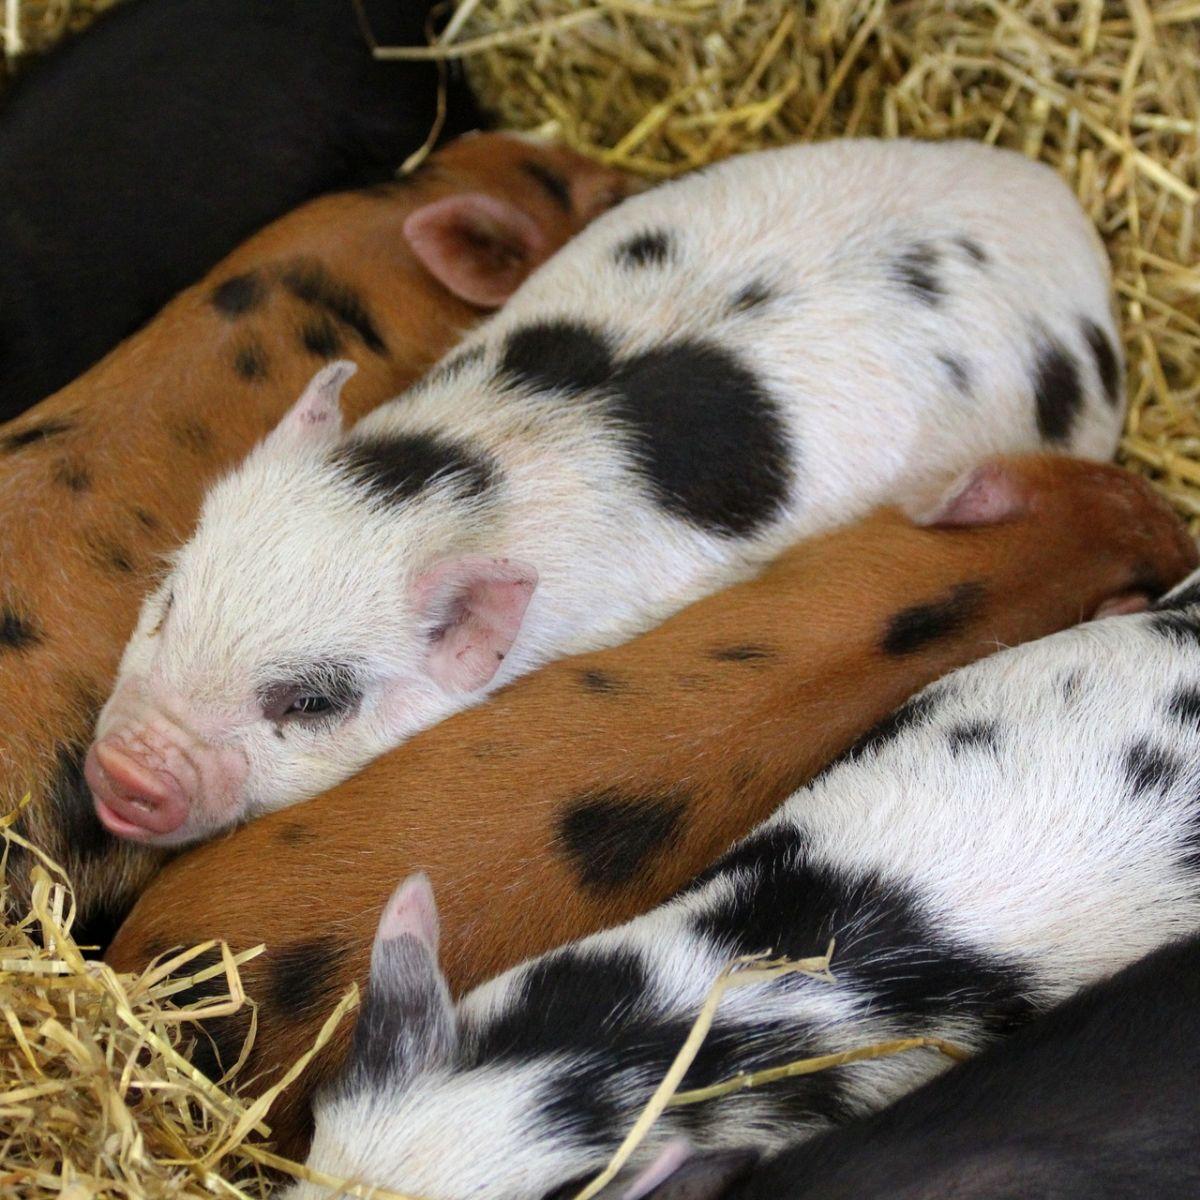 Piglets babies